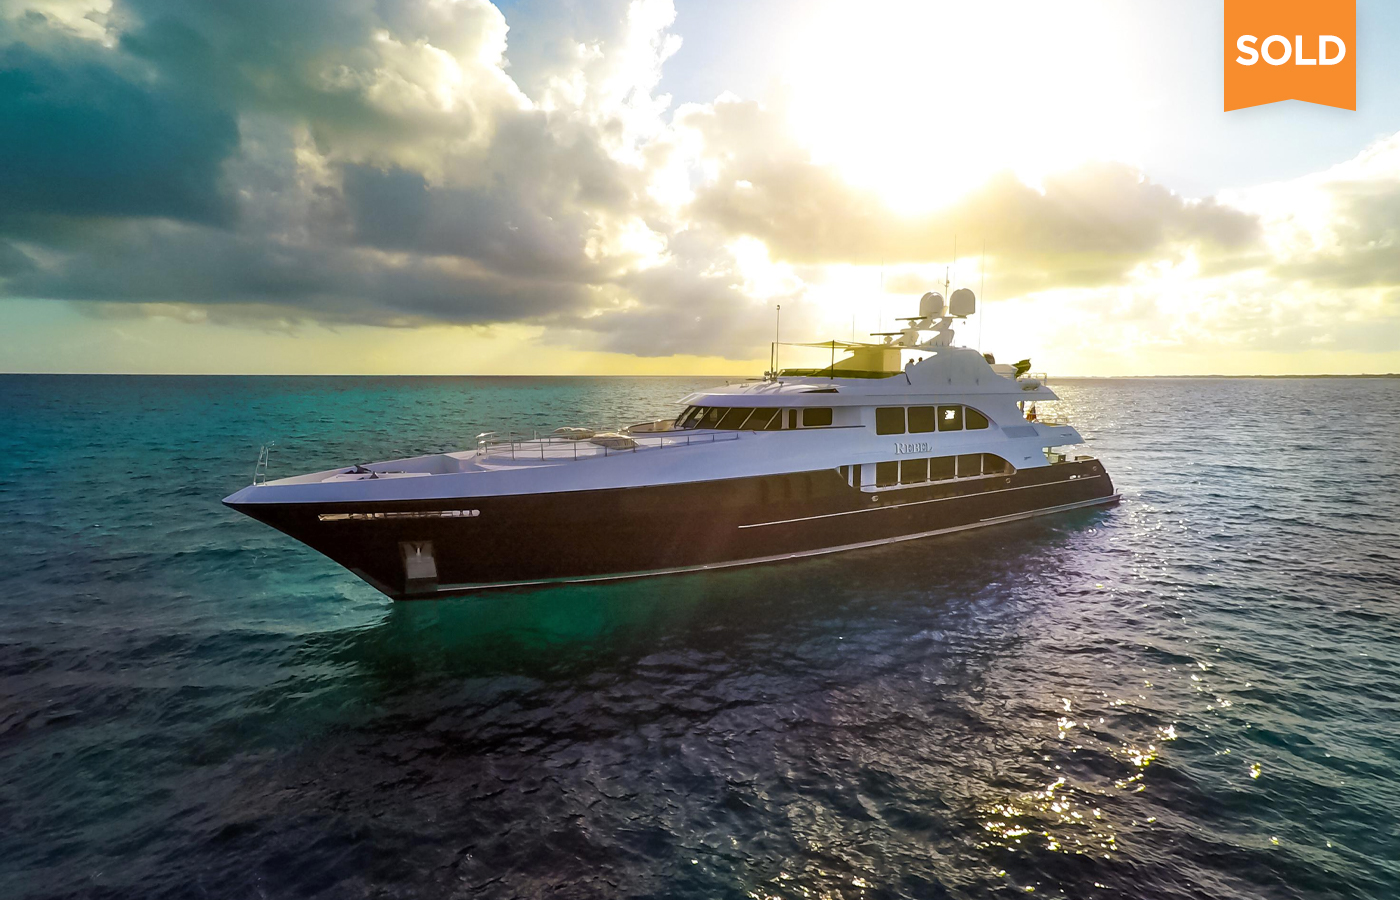 157' Trinity Yachts Sold By Kurt Bosshardt